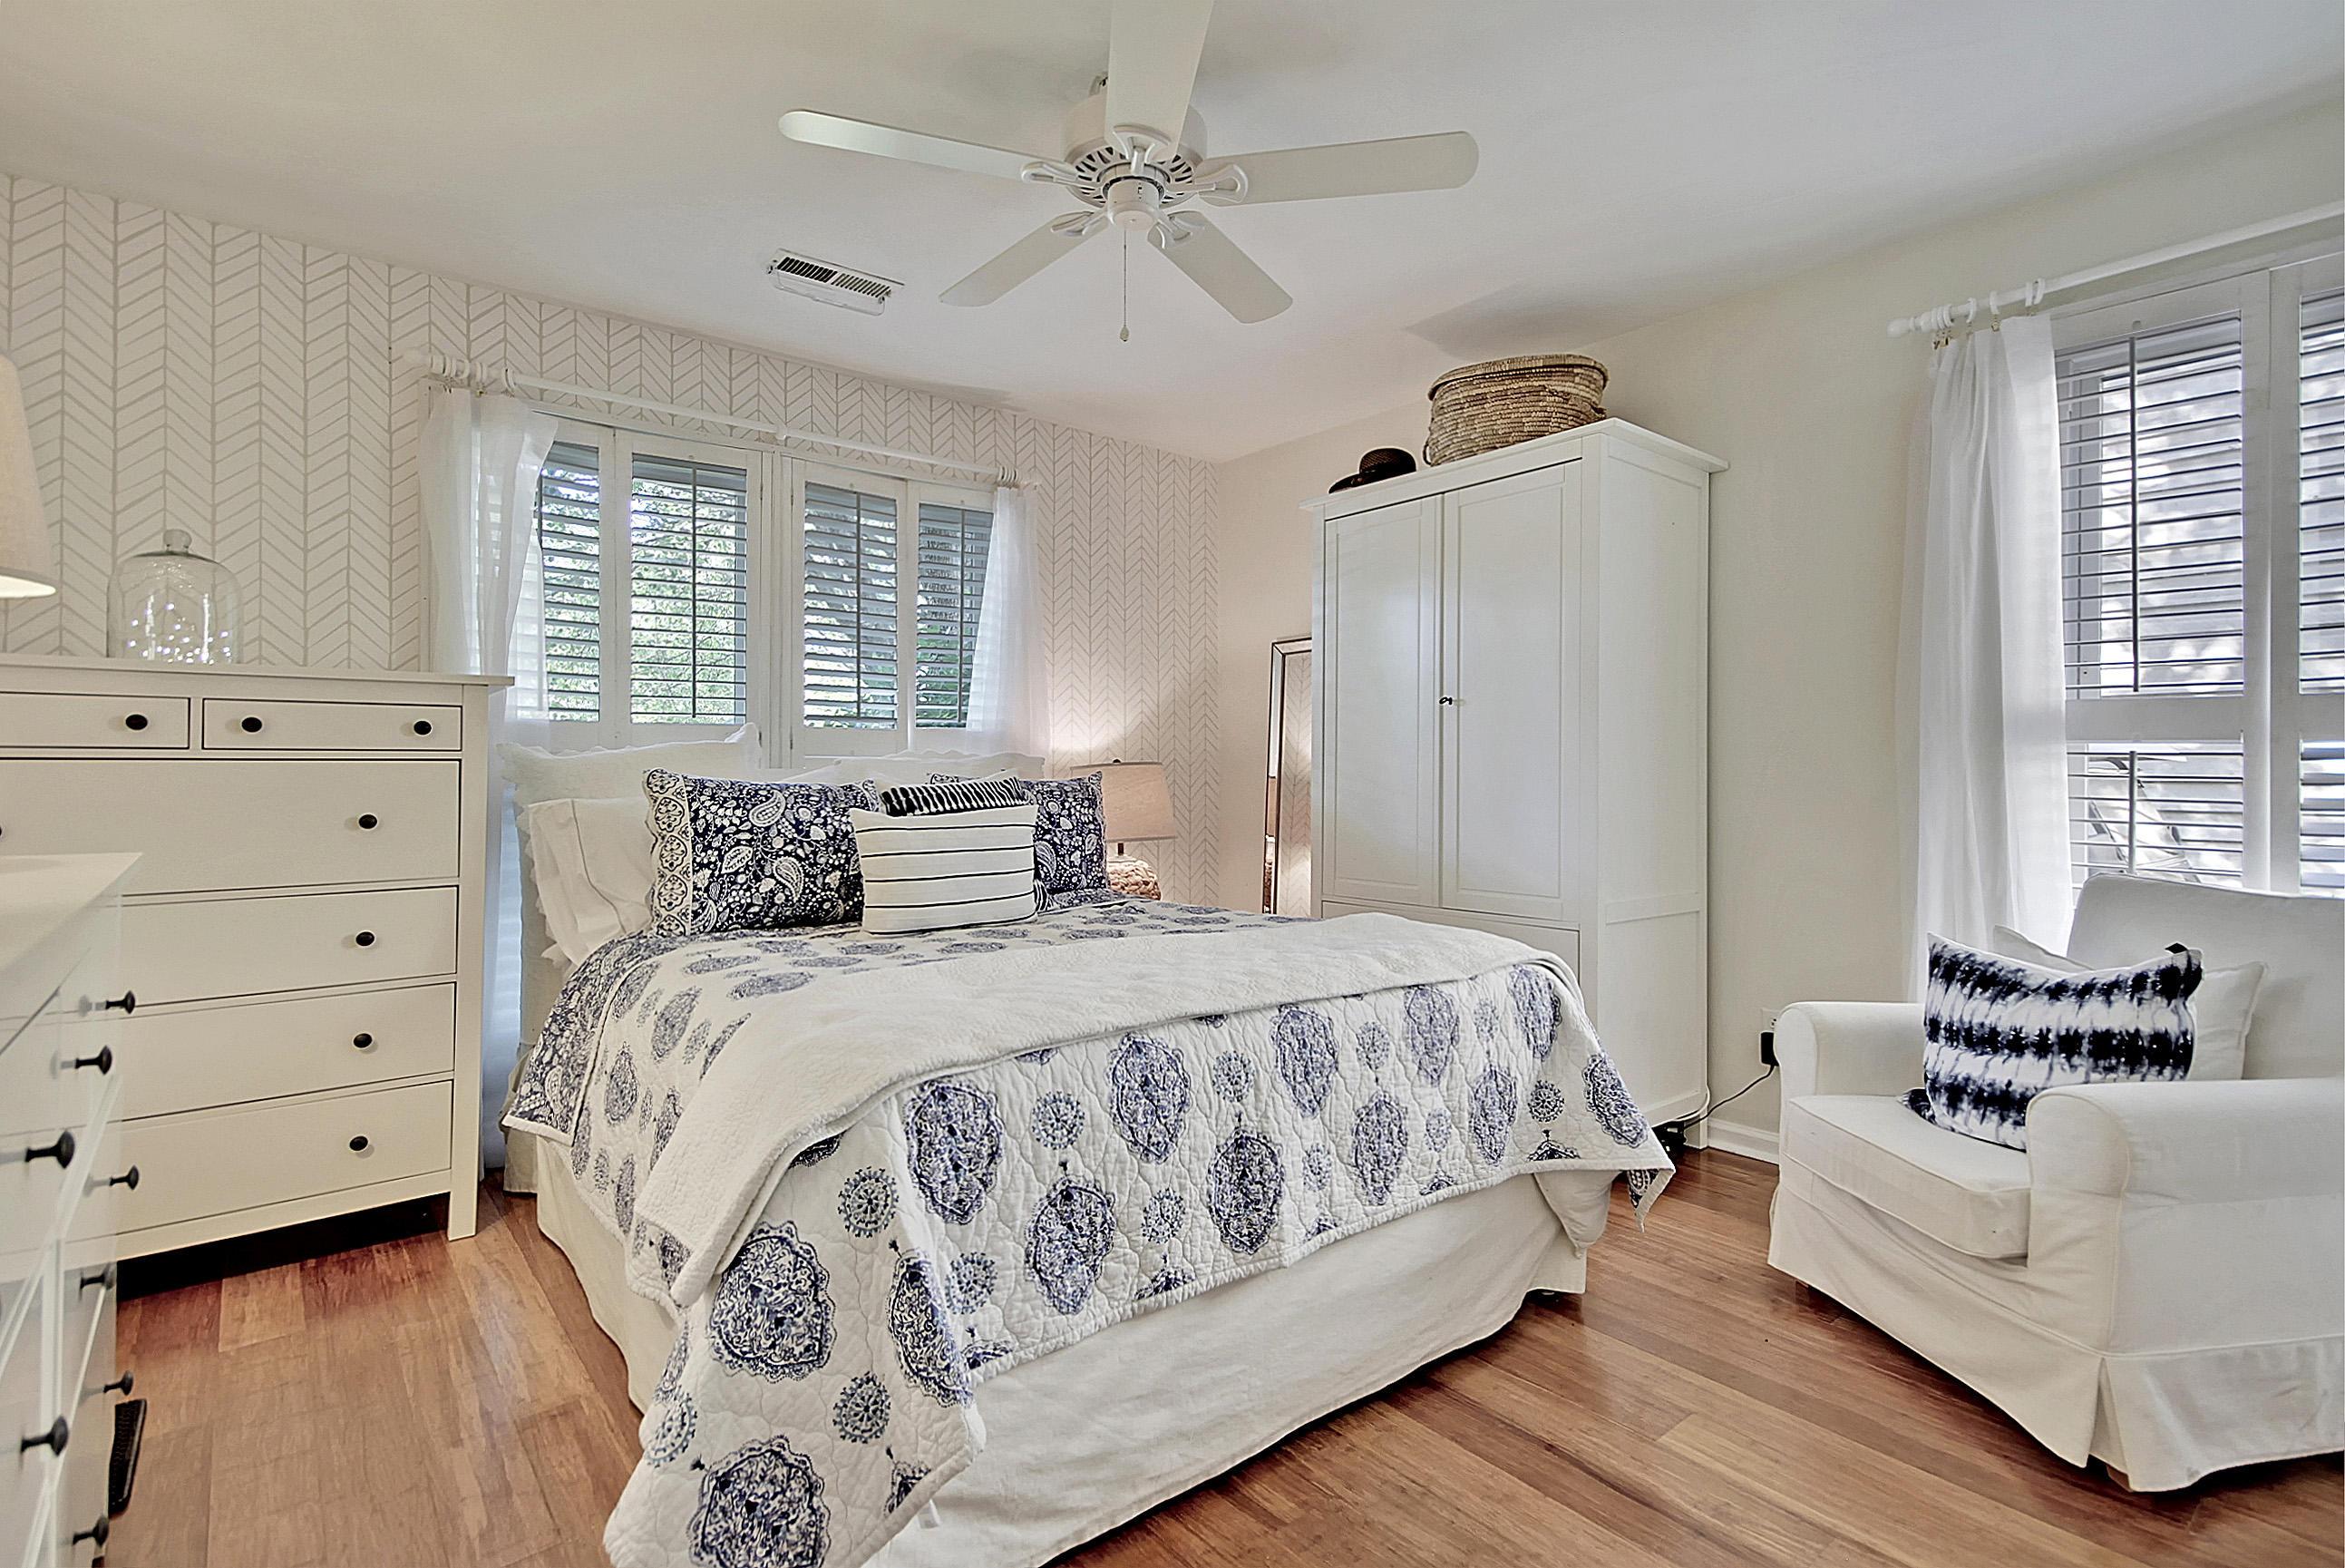 Pirates Cove Homes For Sale - 1492 Ketch, Mount Pleasant, SC - 12